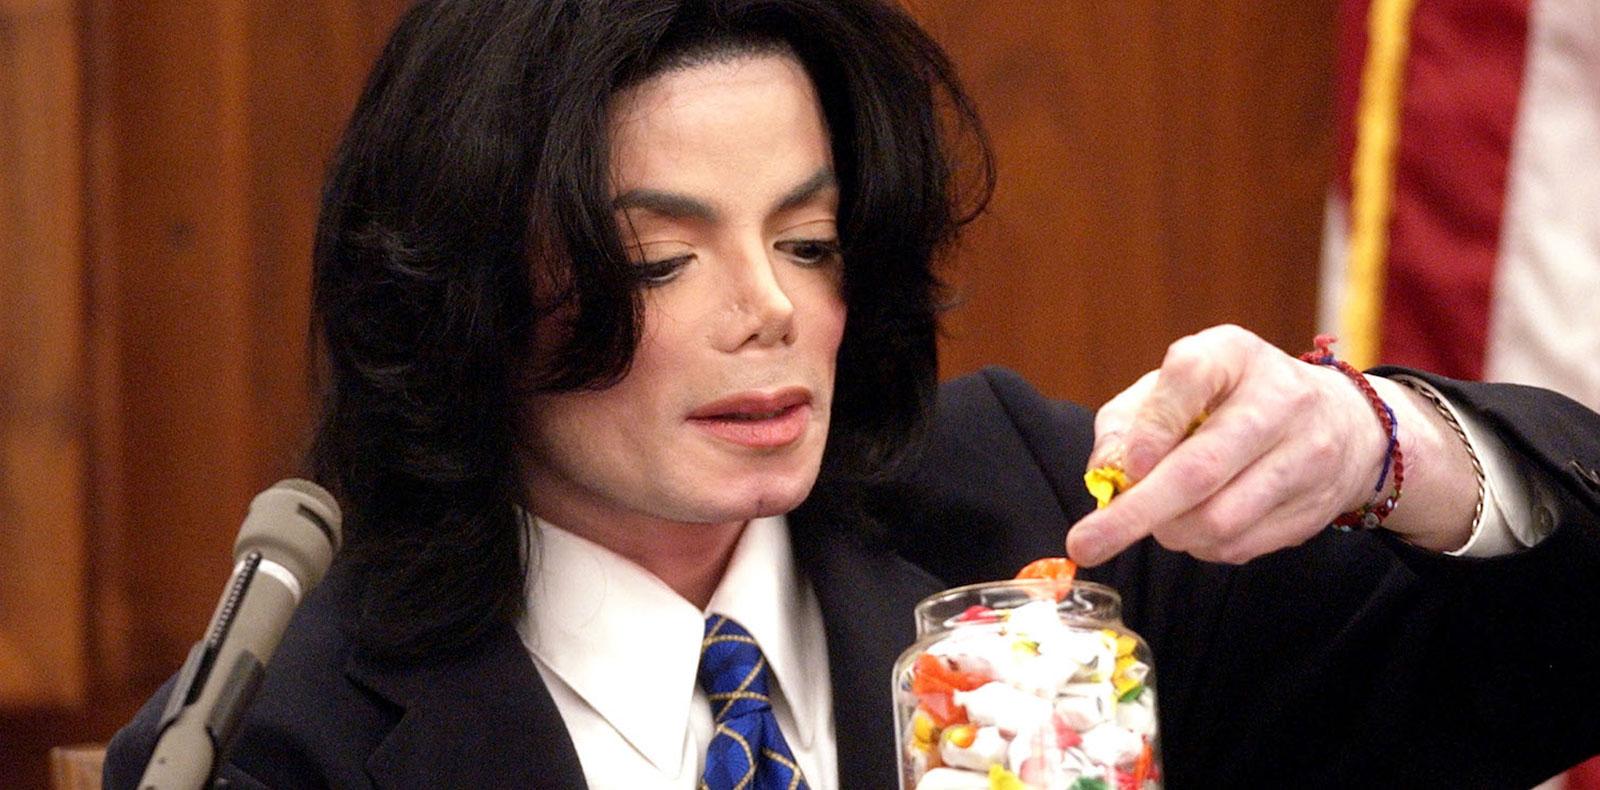 Michael Jackson's trial [2005].